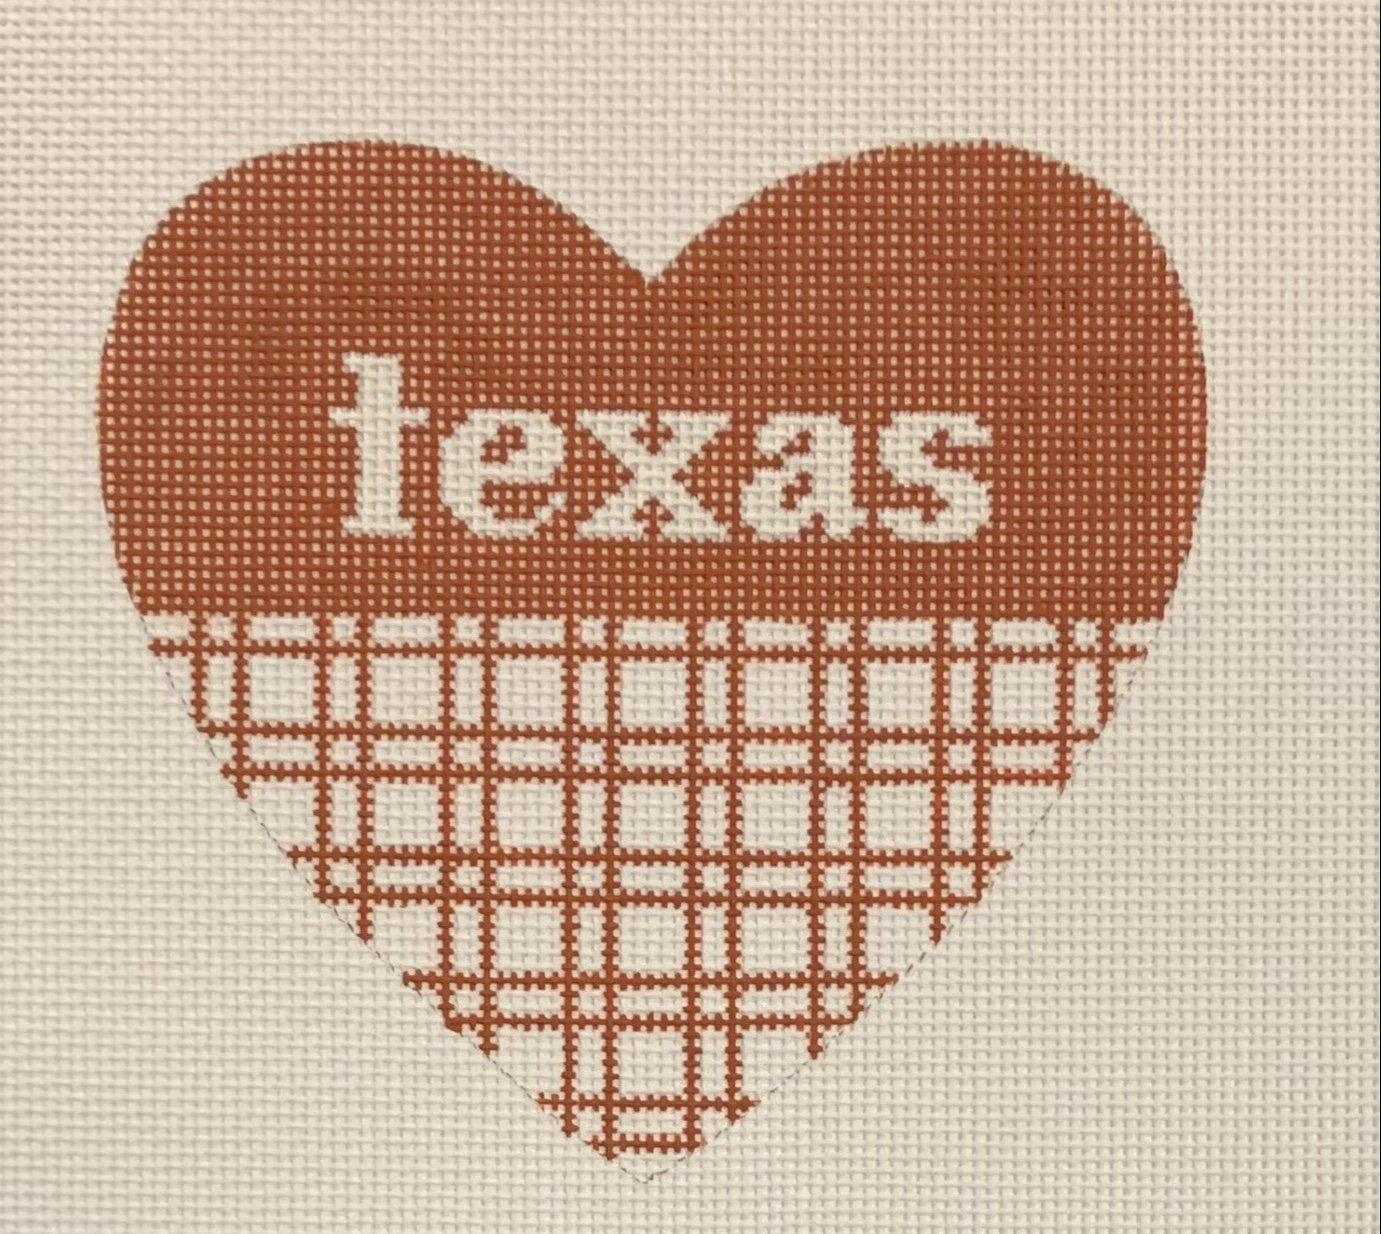 Texas Heart